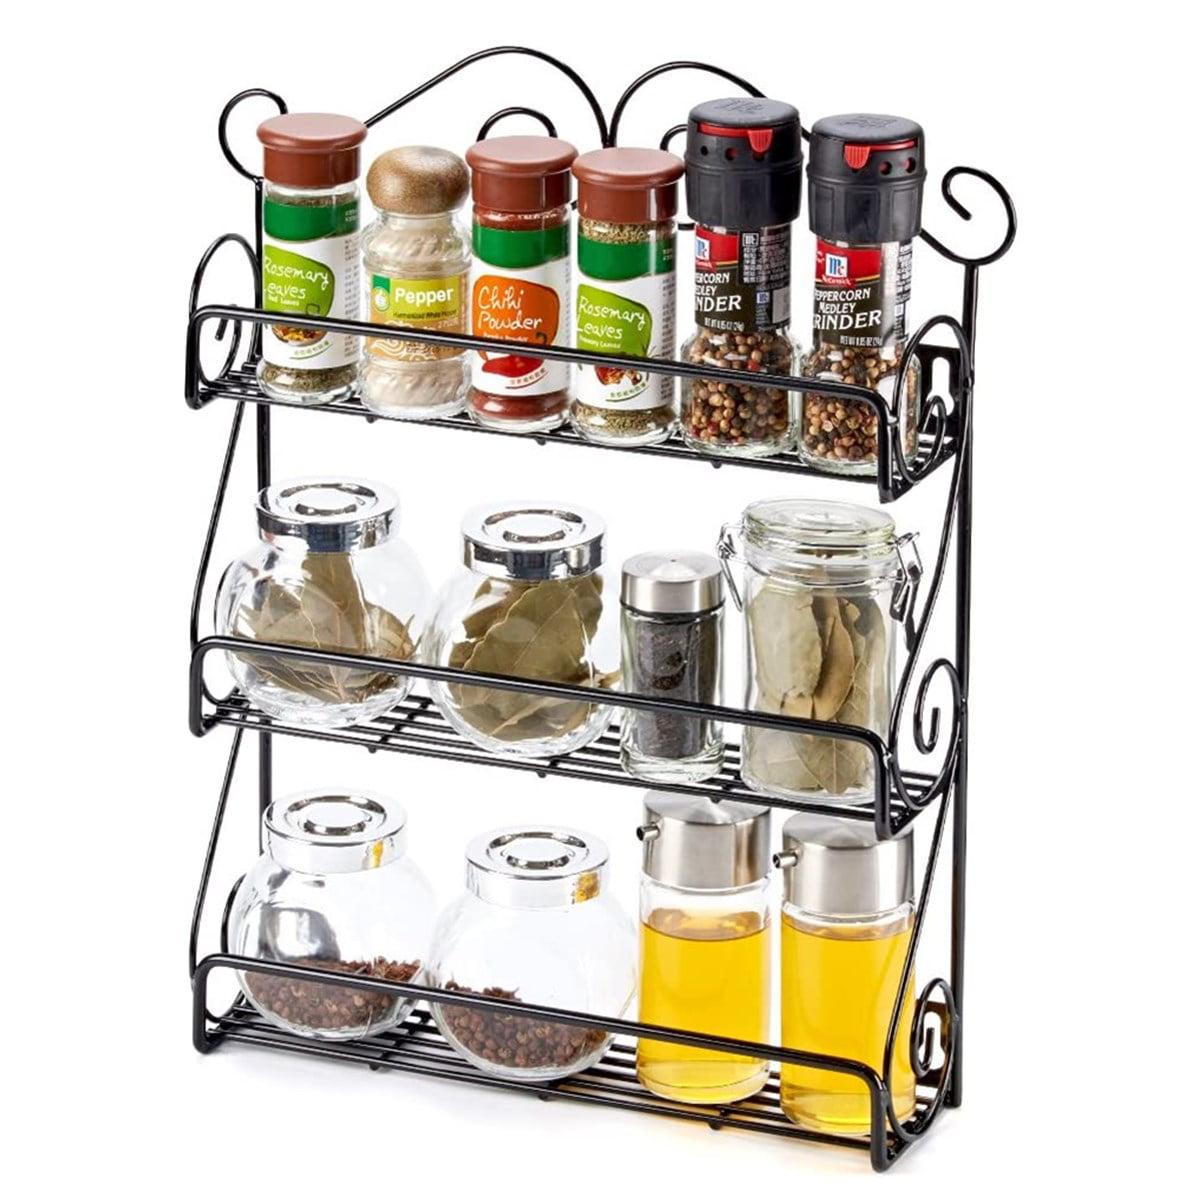 3 Tiers Kitchen Countertop Spice Rack Organizer Spice Rack ...